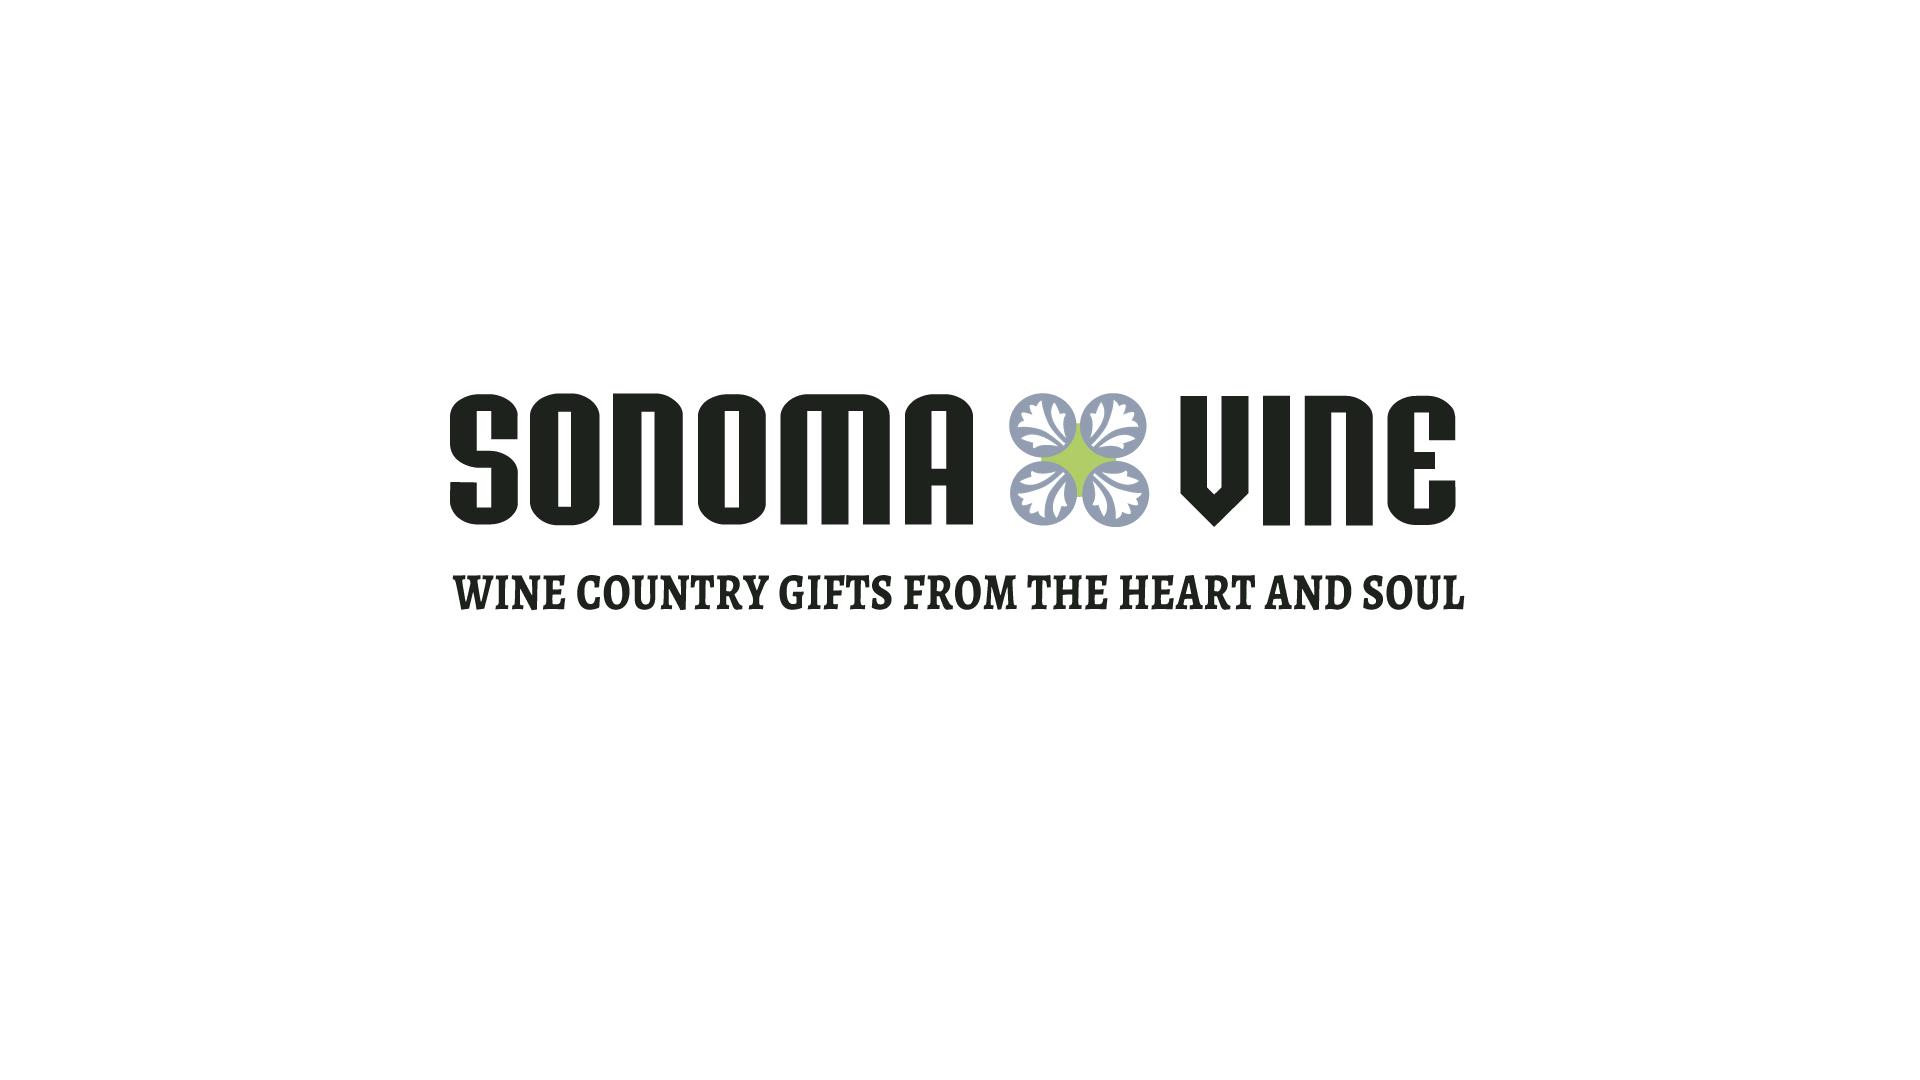 Sonoma County Wine Country Logo